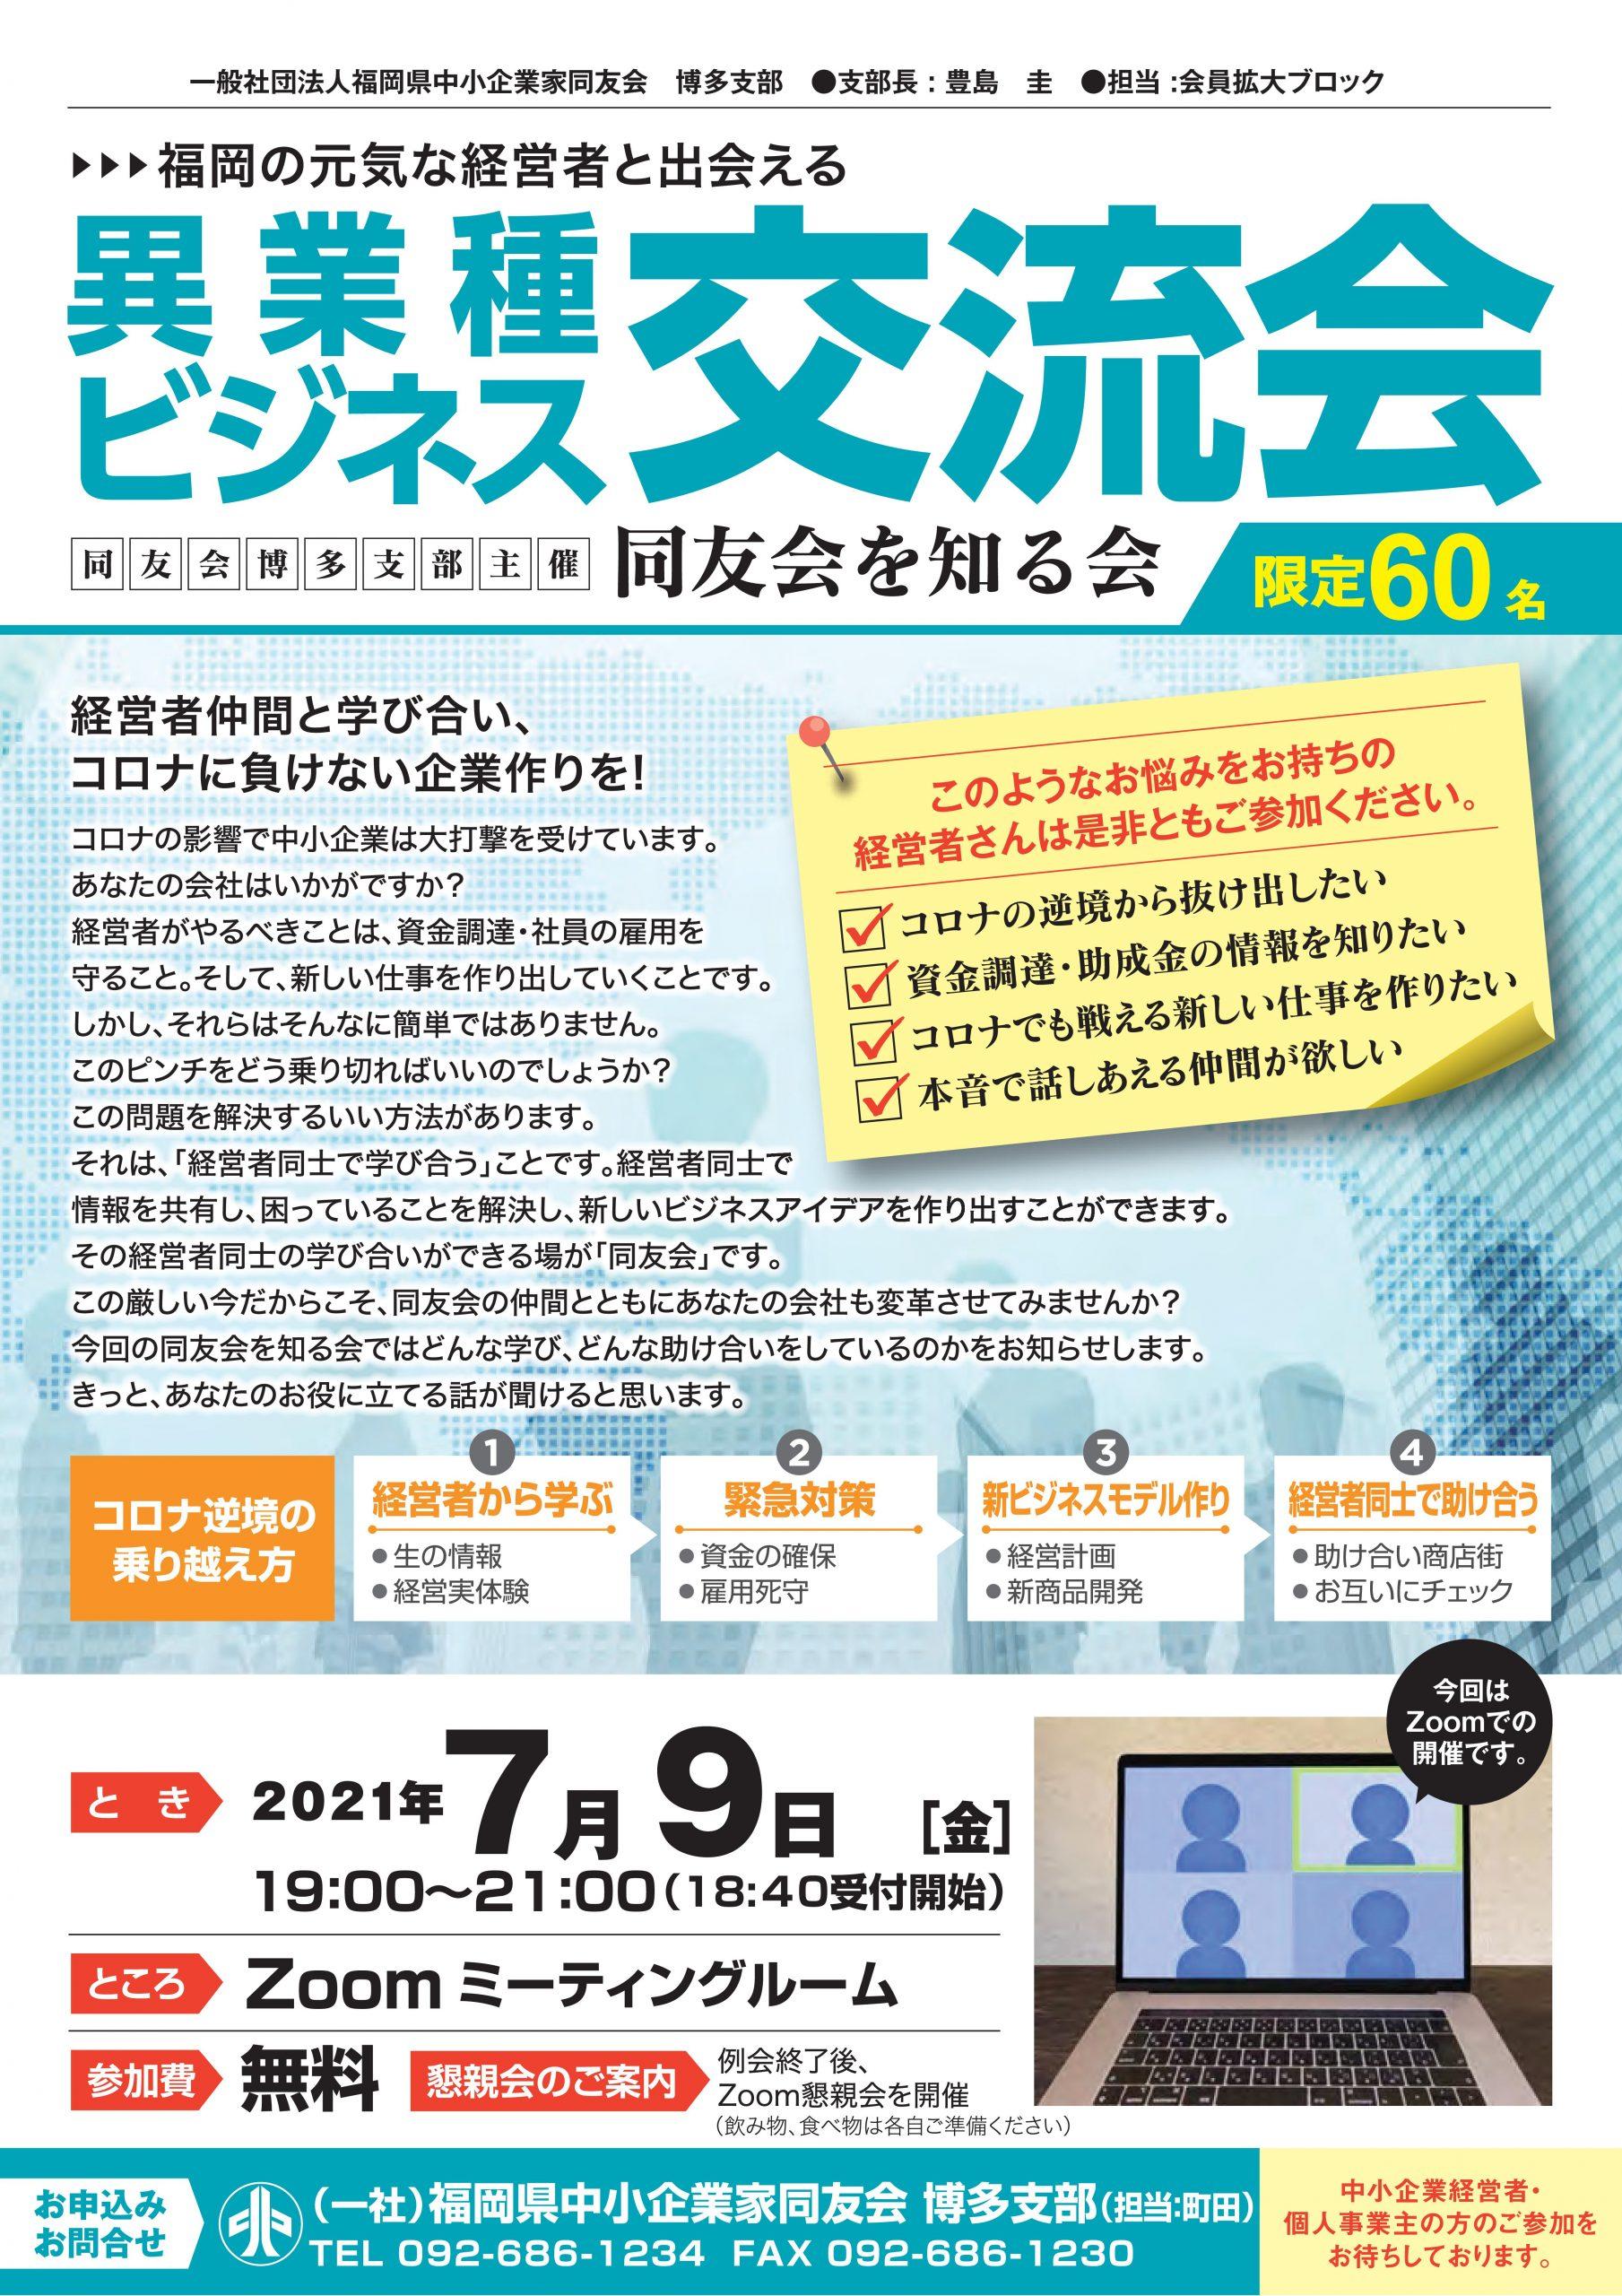 Zoom開催!博多支部 同友会を知る会 ~異業種ビジネス交流会~